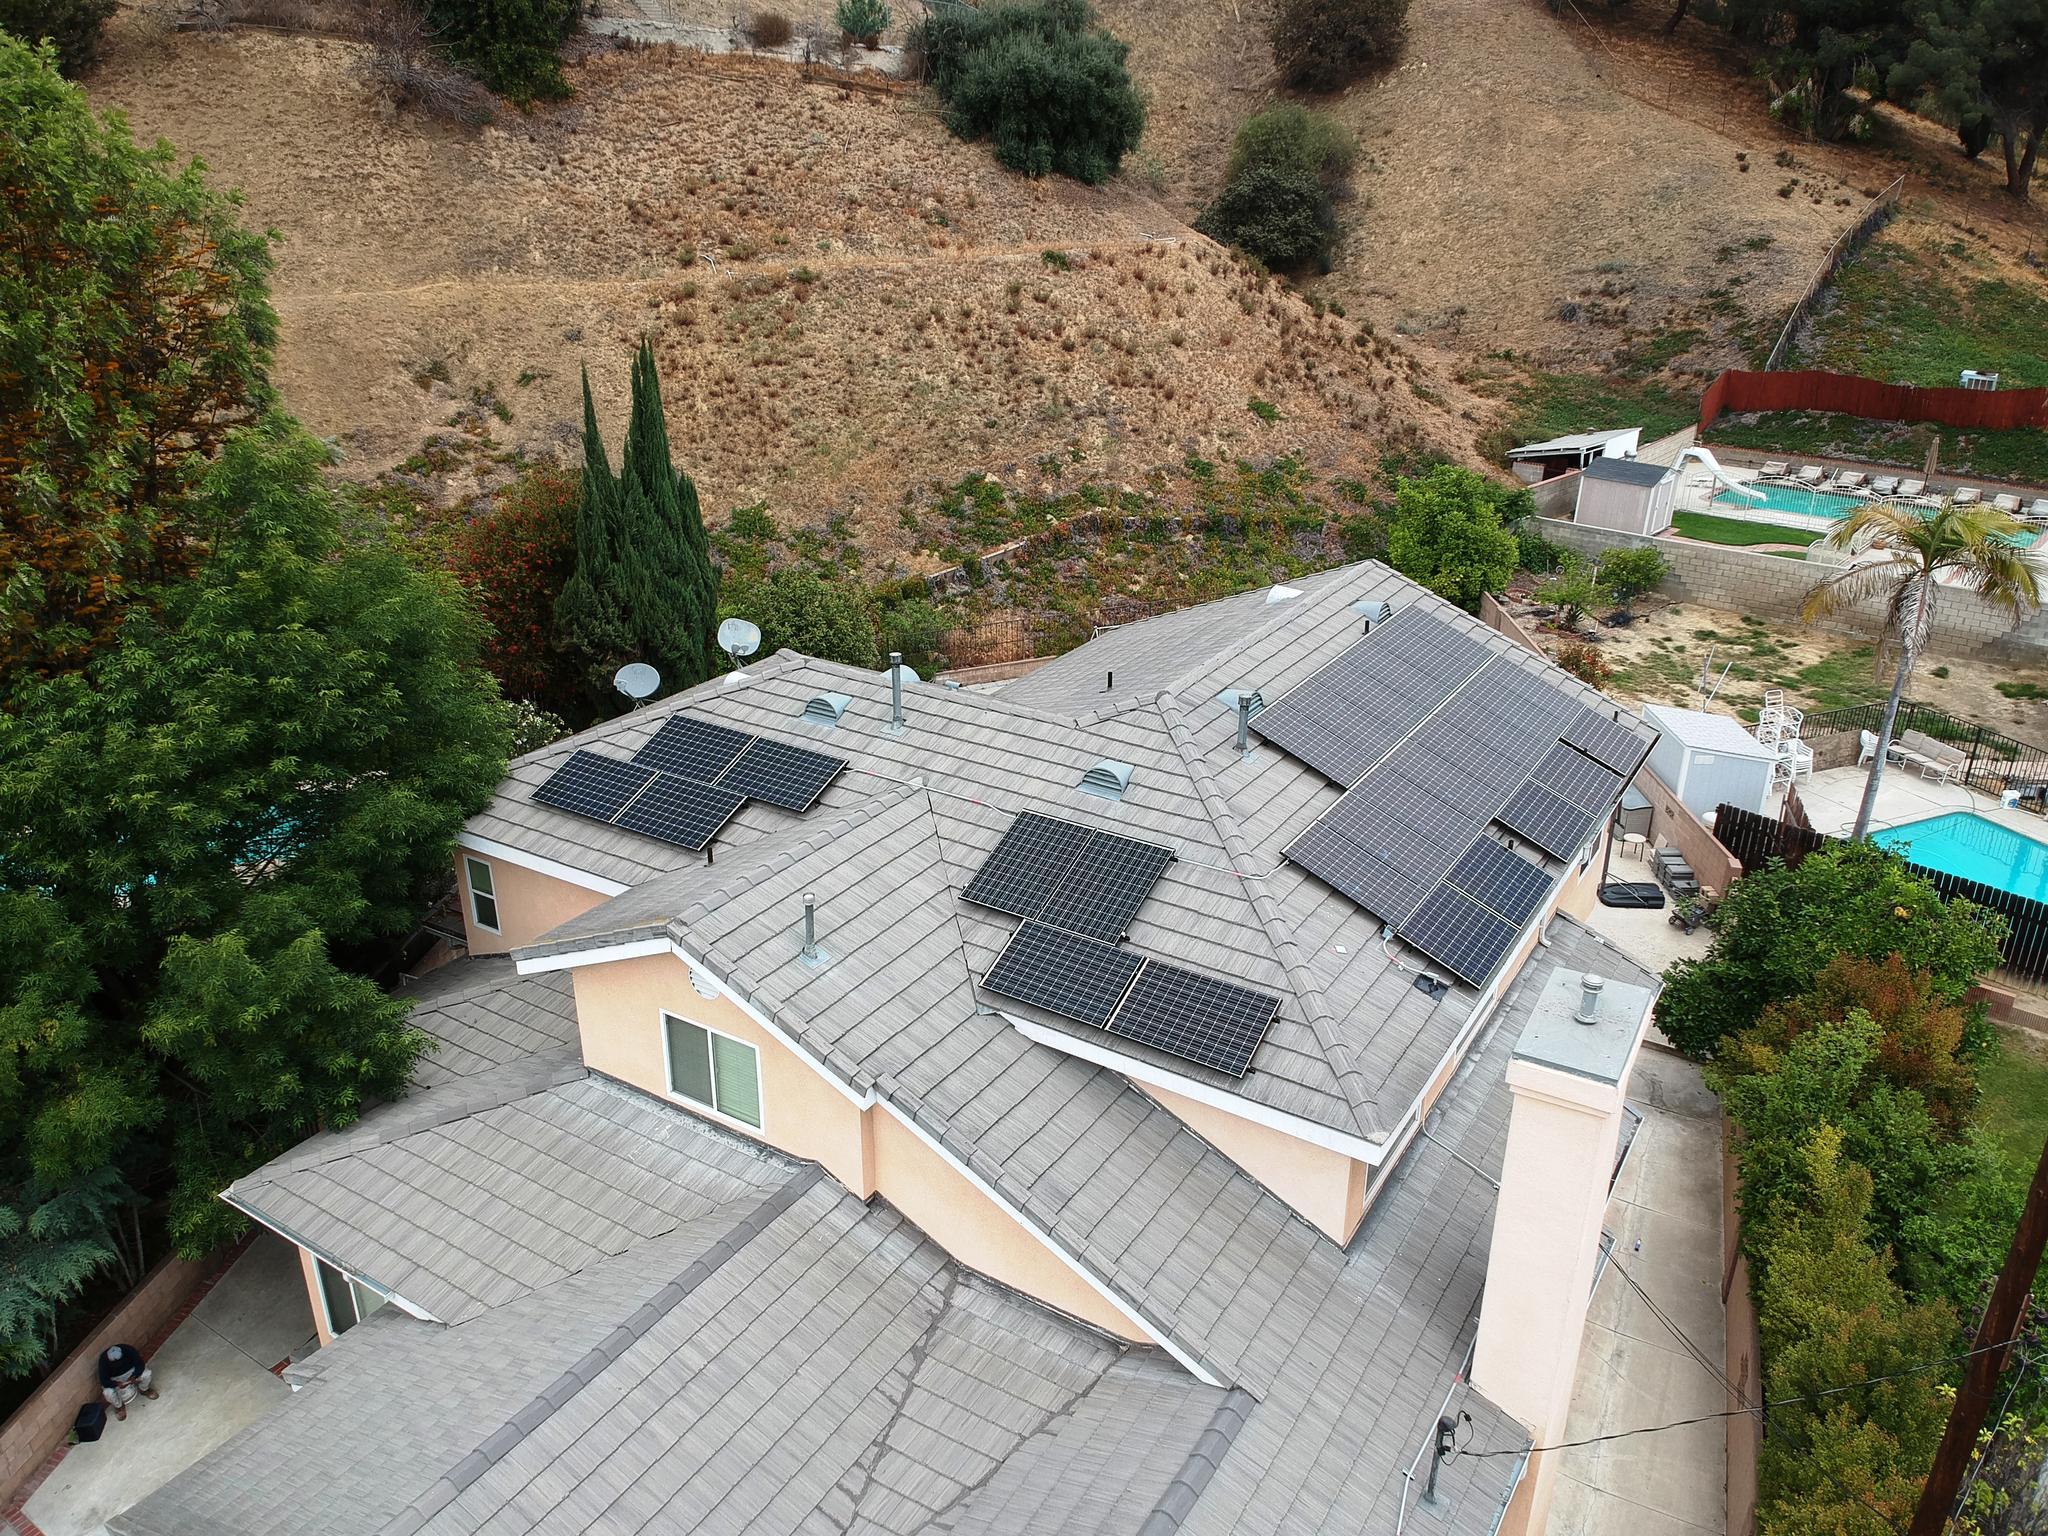 Artgreen Solar Profile Amp Reviews 2019 Energysage